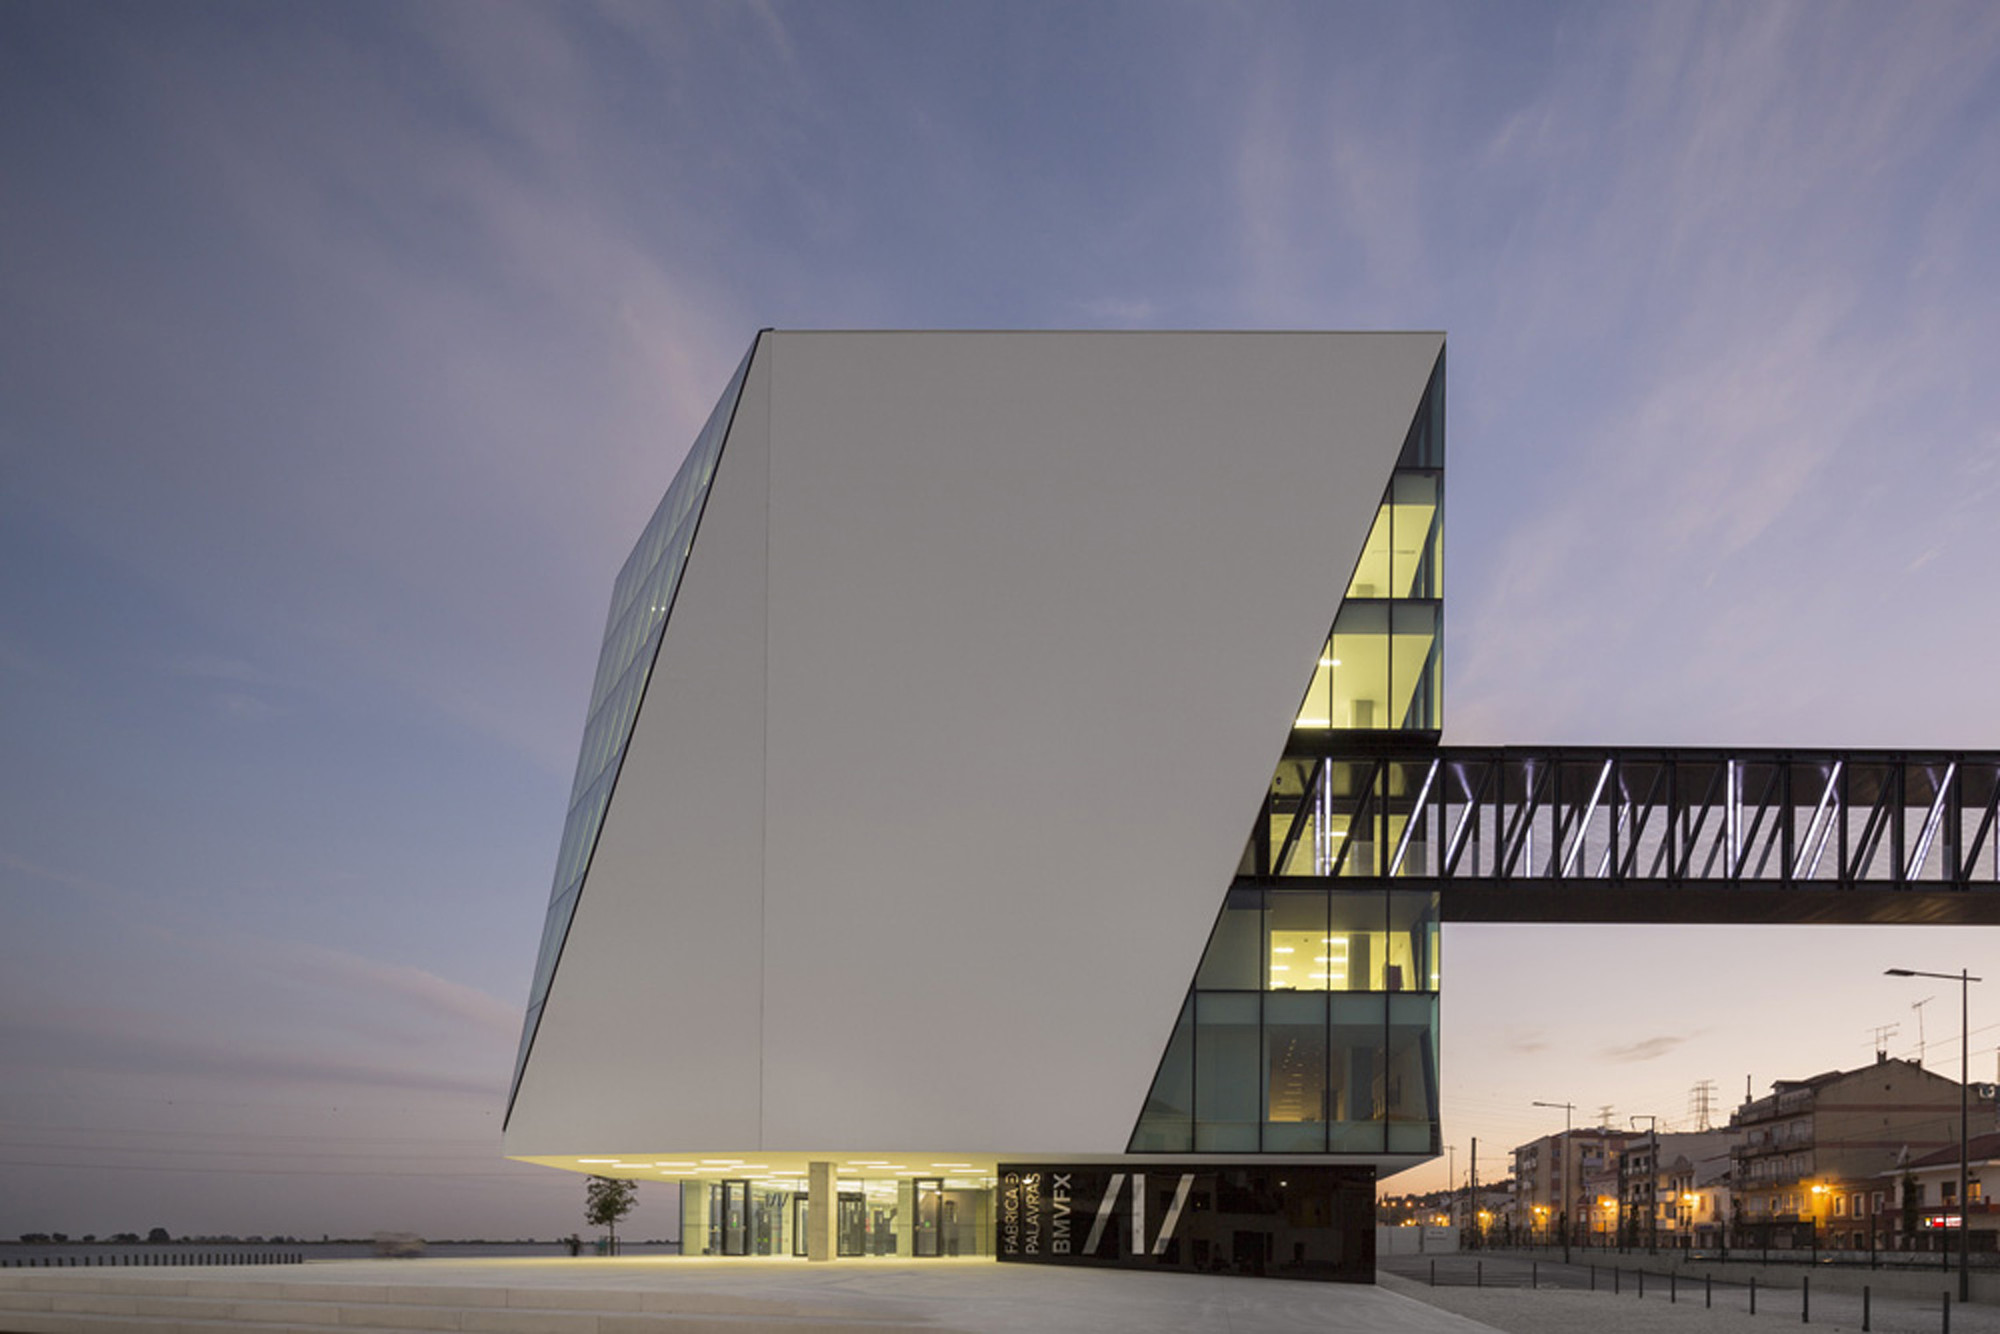 Vila Franca de Xira Municipal Library / Miguel Arruda Arquitectos Associados